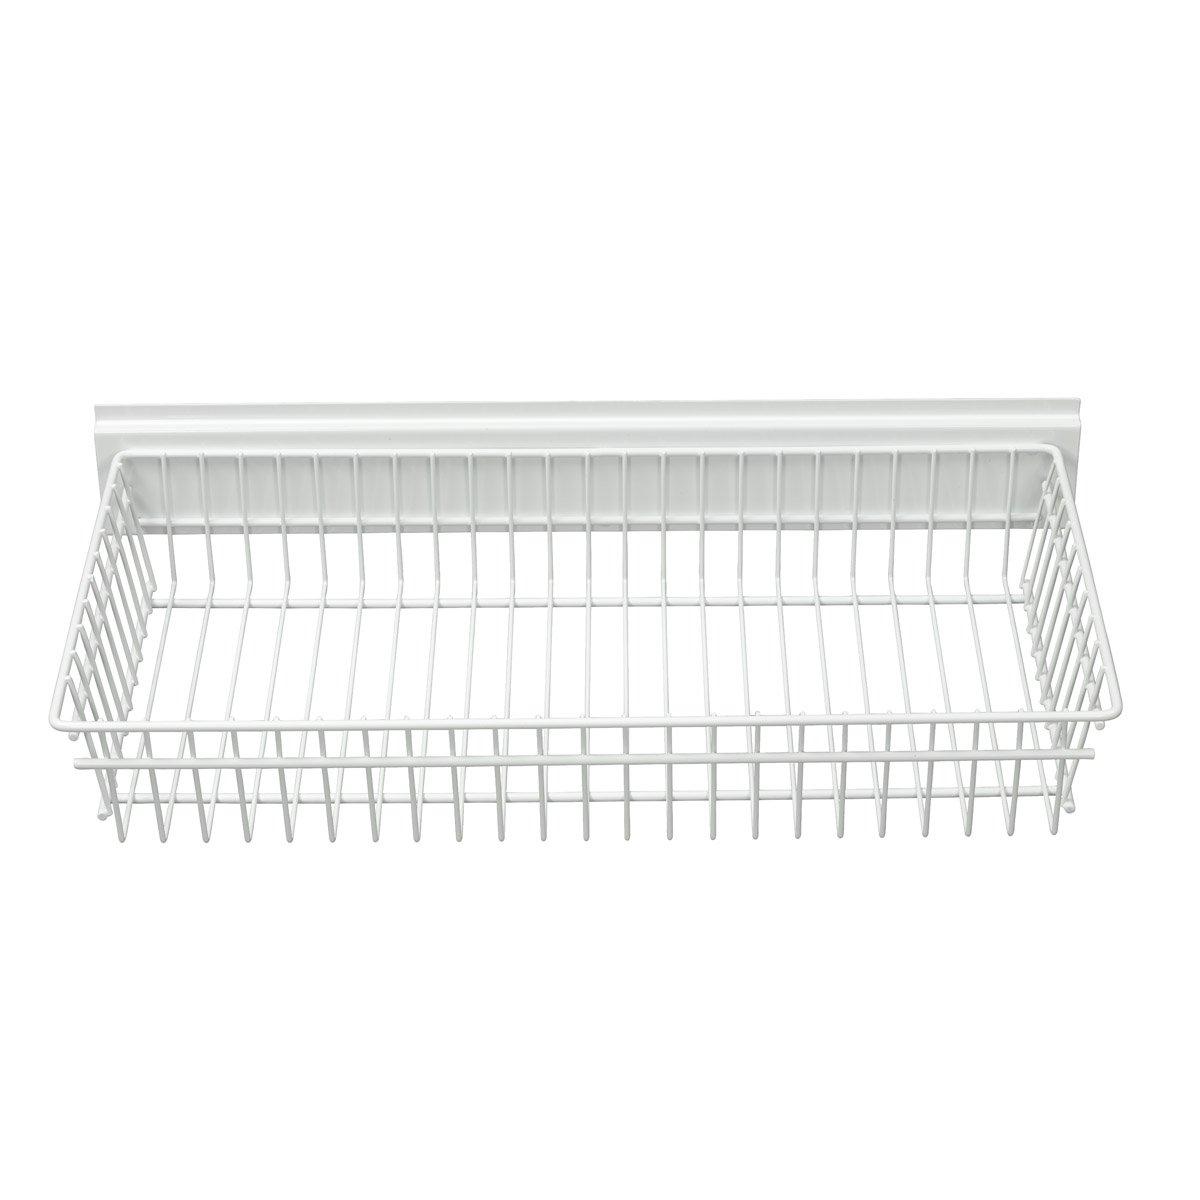 Garage Tek Shallow Basket for Garage, Kitchen, Office Storage, Mounts on TekTrak and Wall Panel Products GarageTek Inc GT4003E